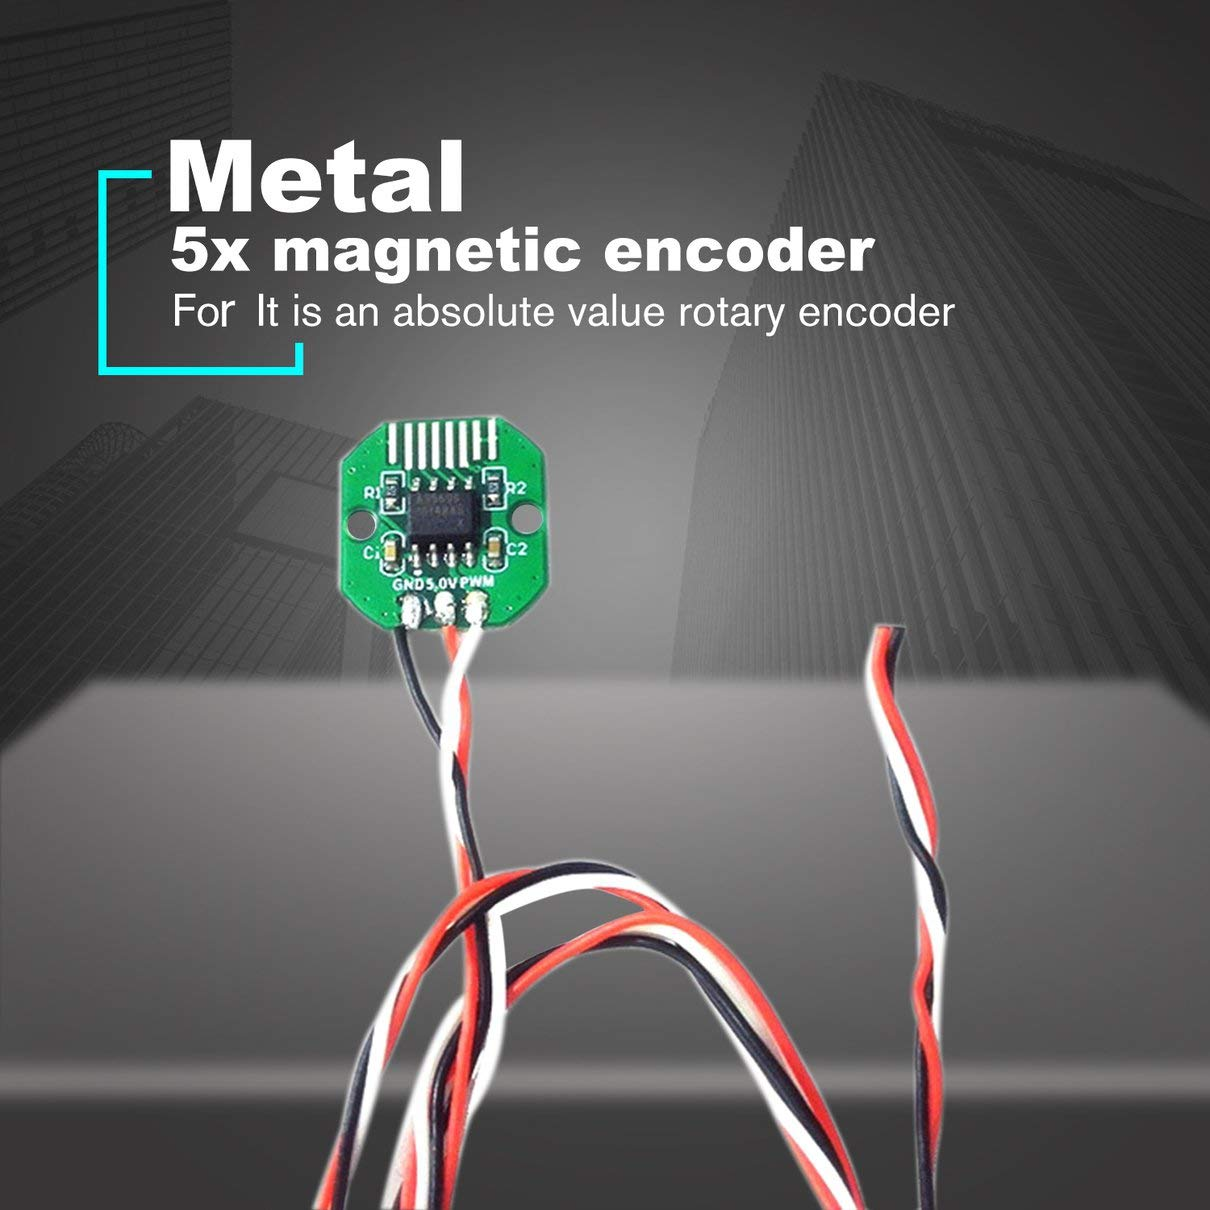 I2C Puerto 12Bit para motor de card/án sin escobillas Rotativo incremental con anillo magn/ético Togames-ES verde AS5600 Codificador rotativo de valor absoluto PWM